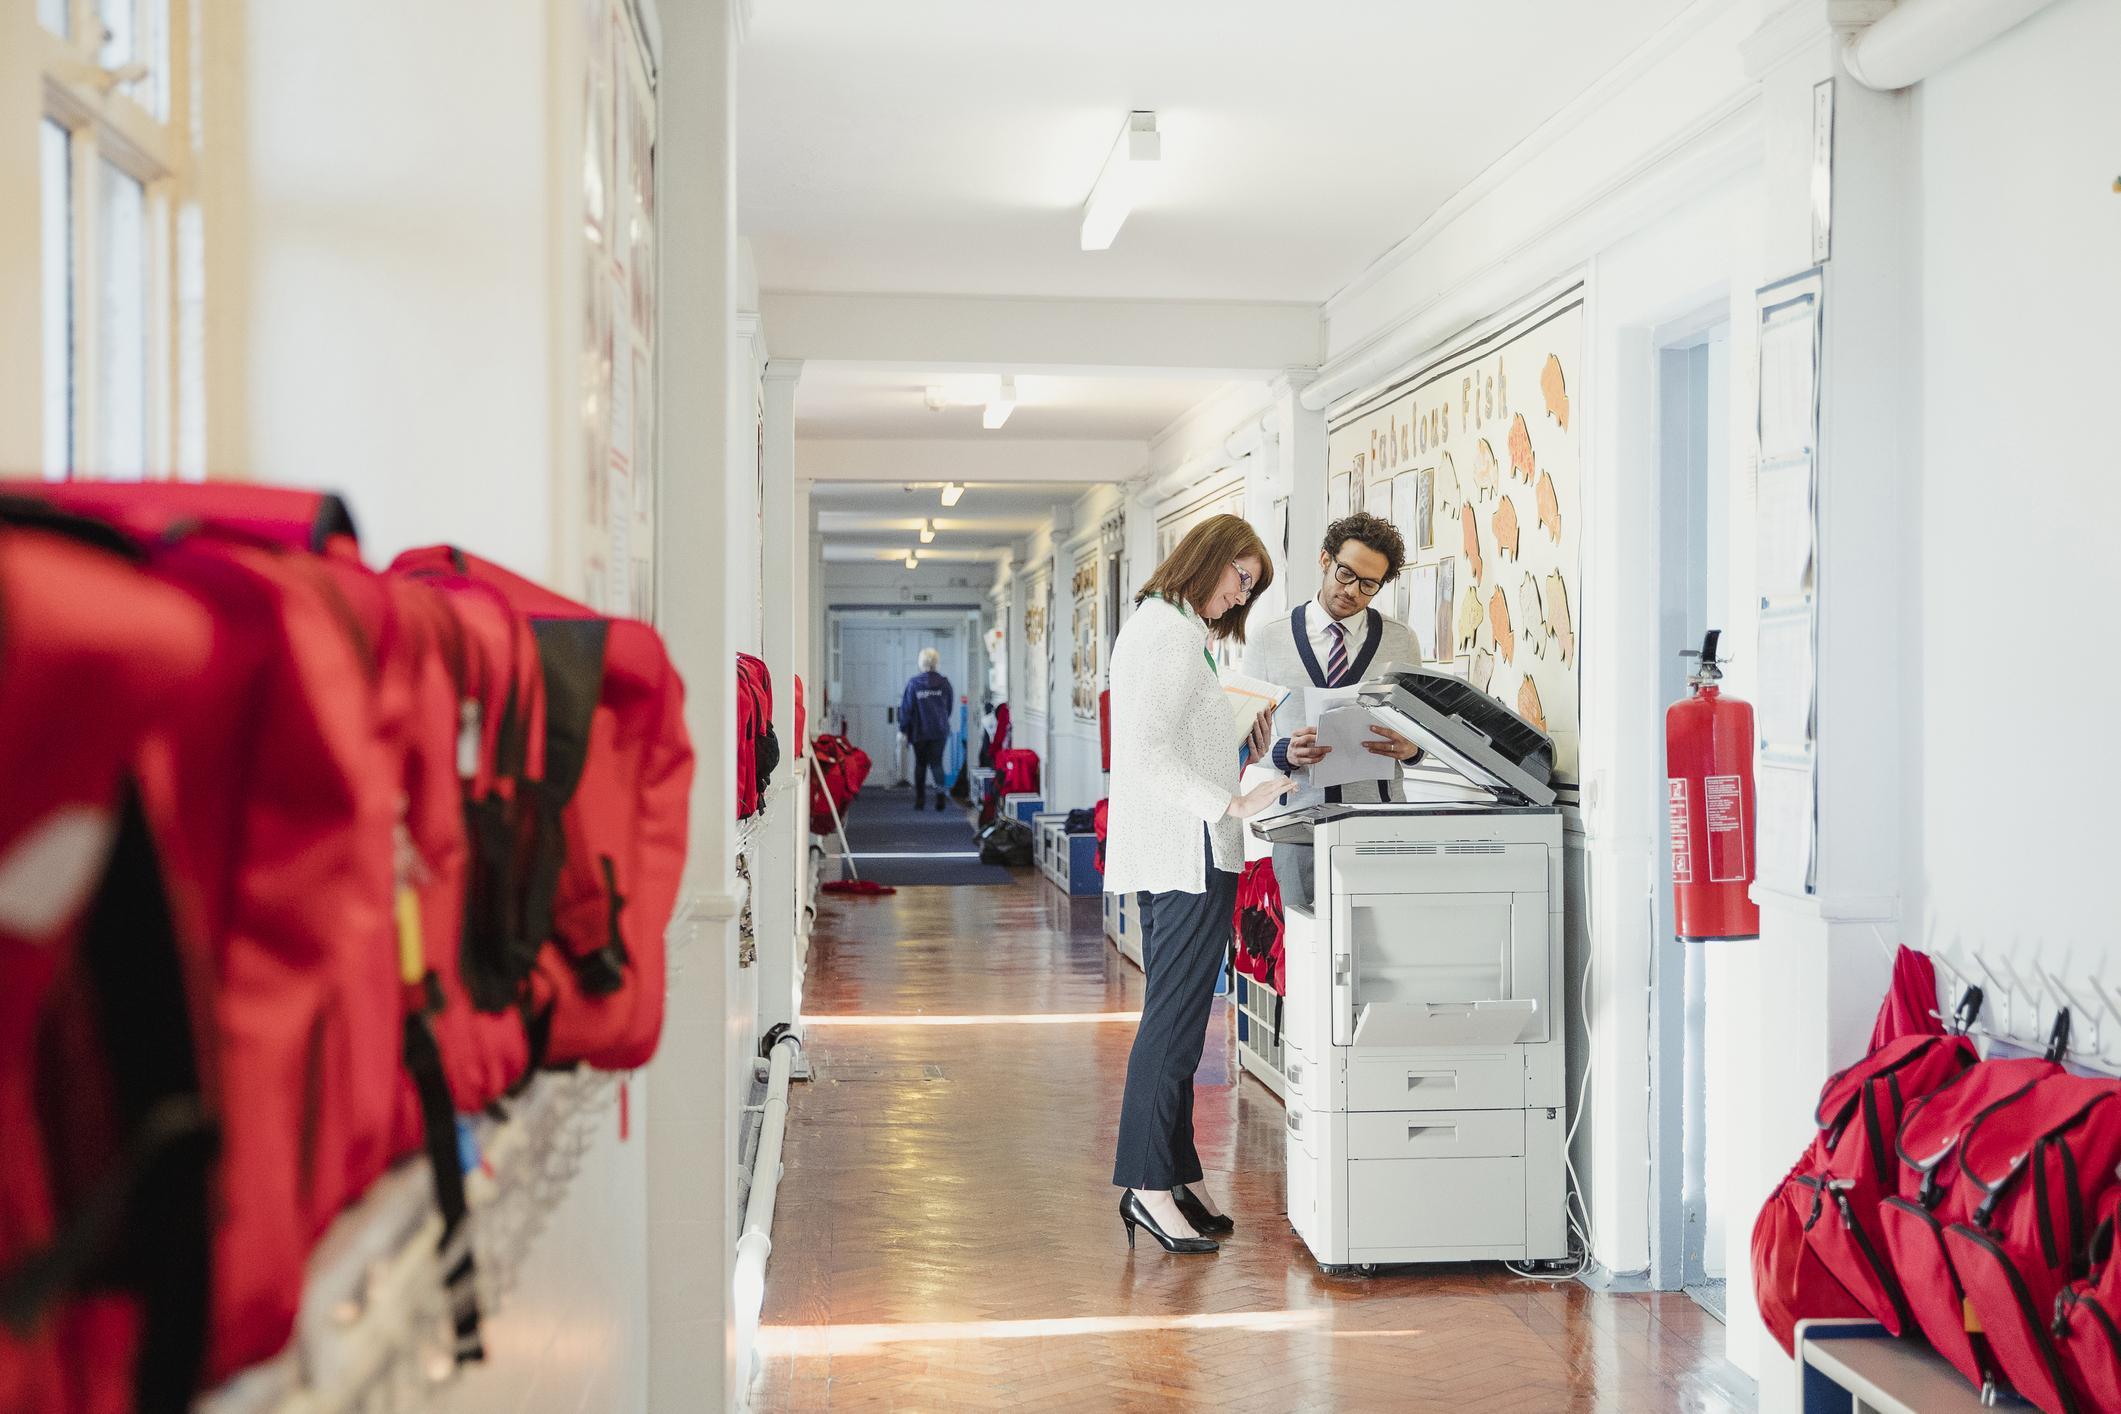 drukarka w szkole